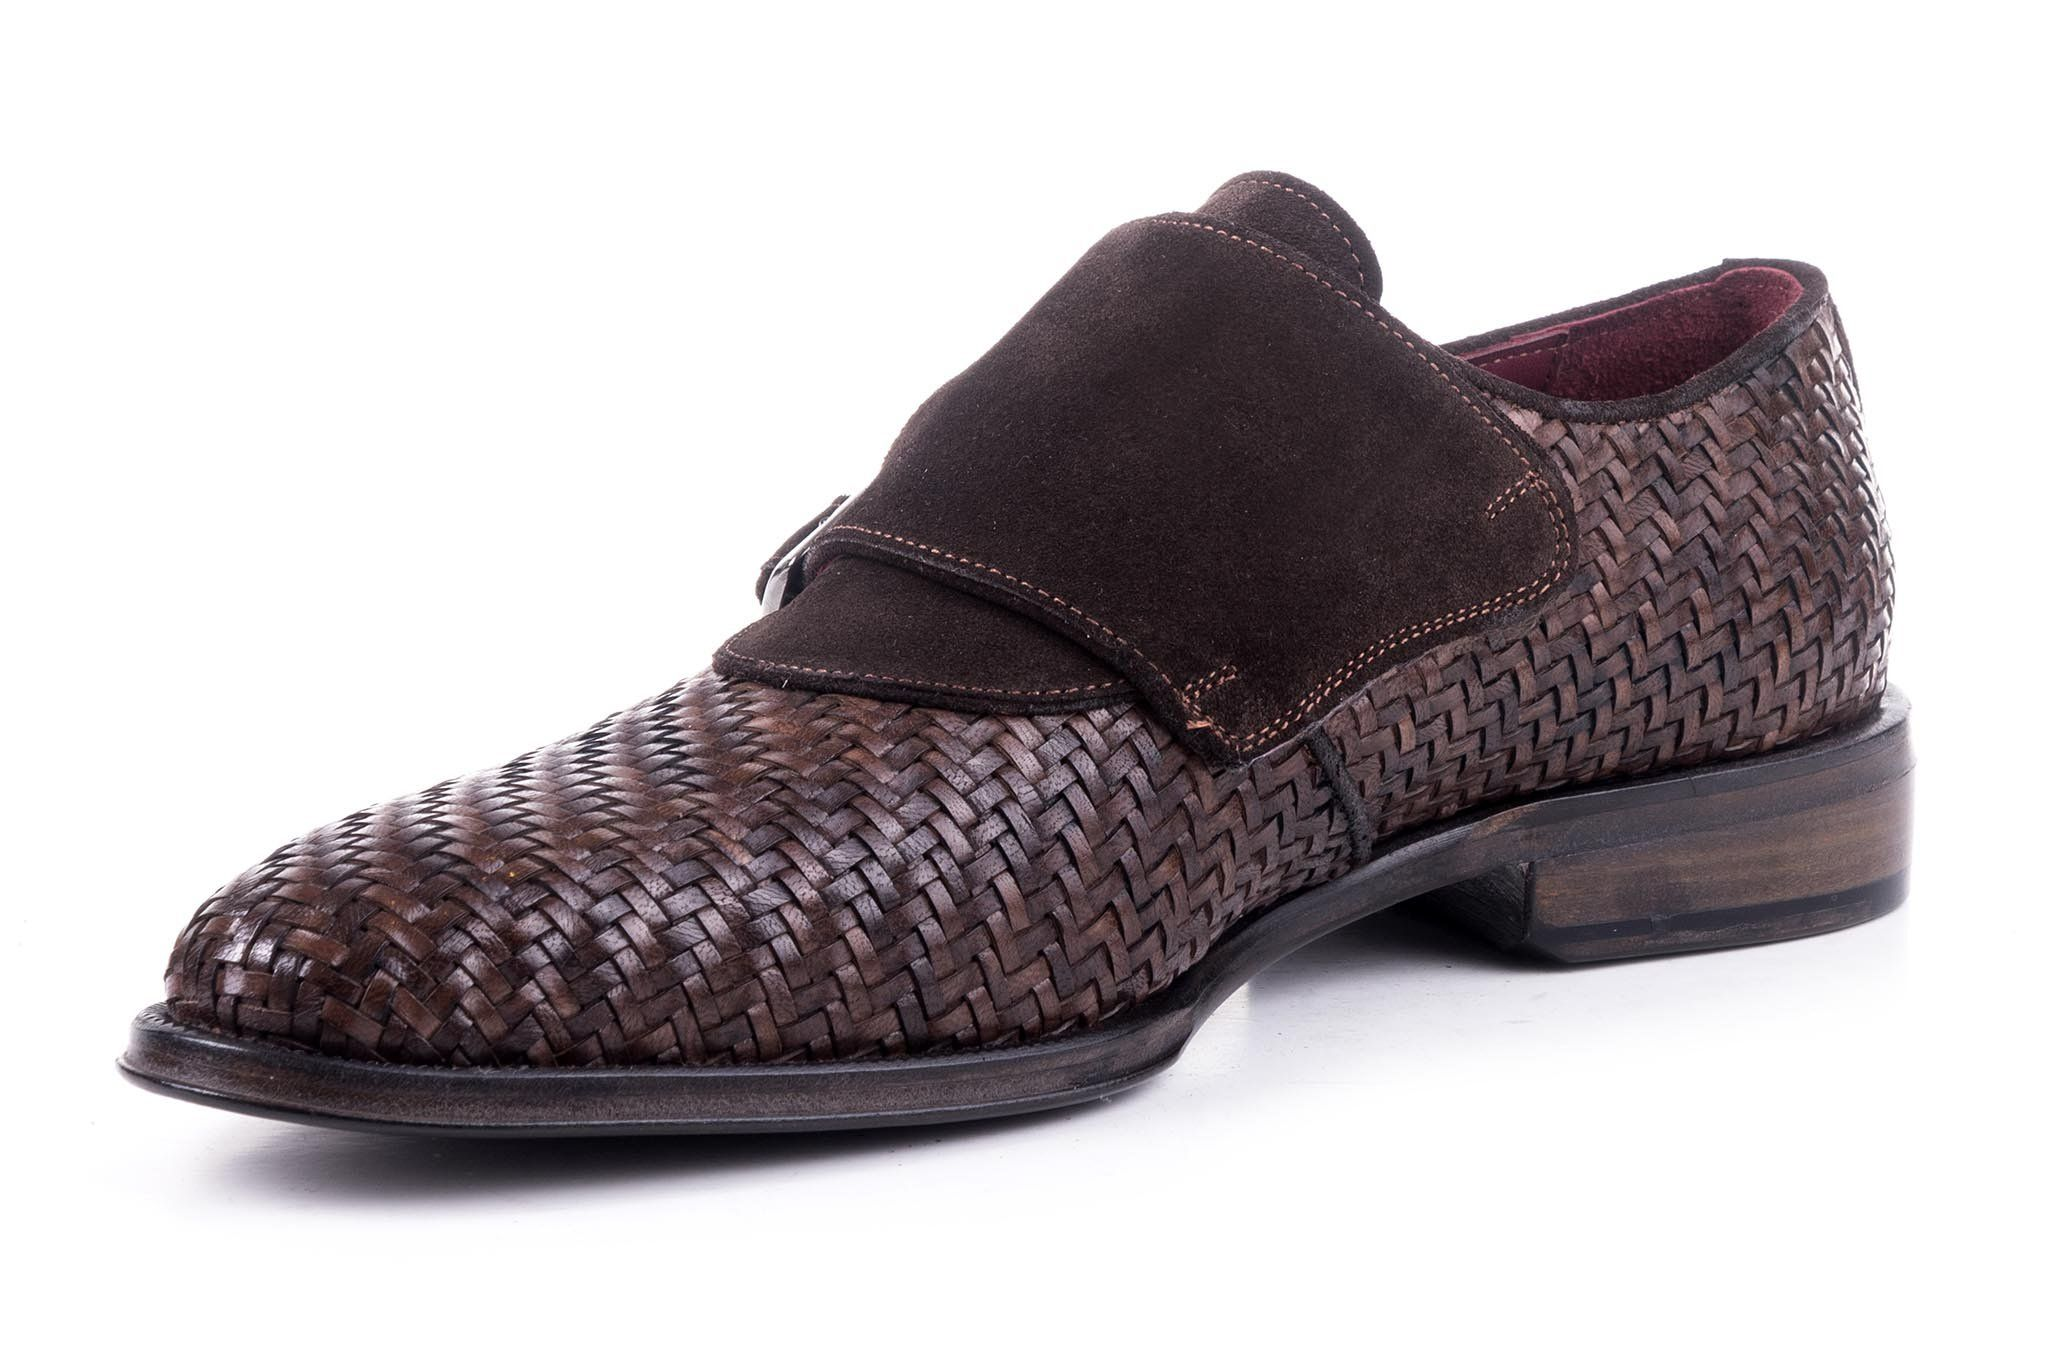 baf36597203 Maglieriapelle handcrafted Tatvan monkstrap in Brown Man Weave